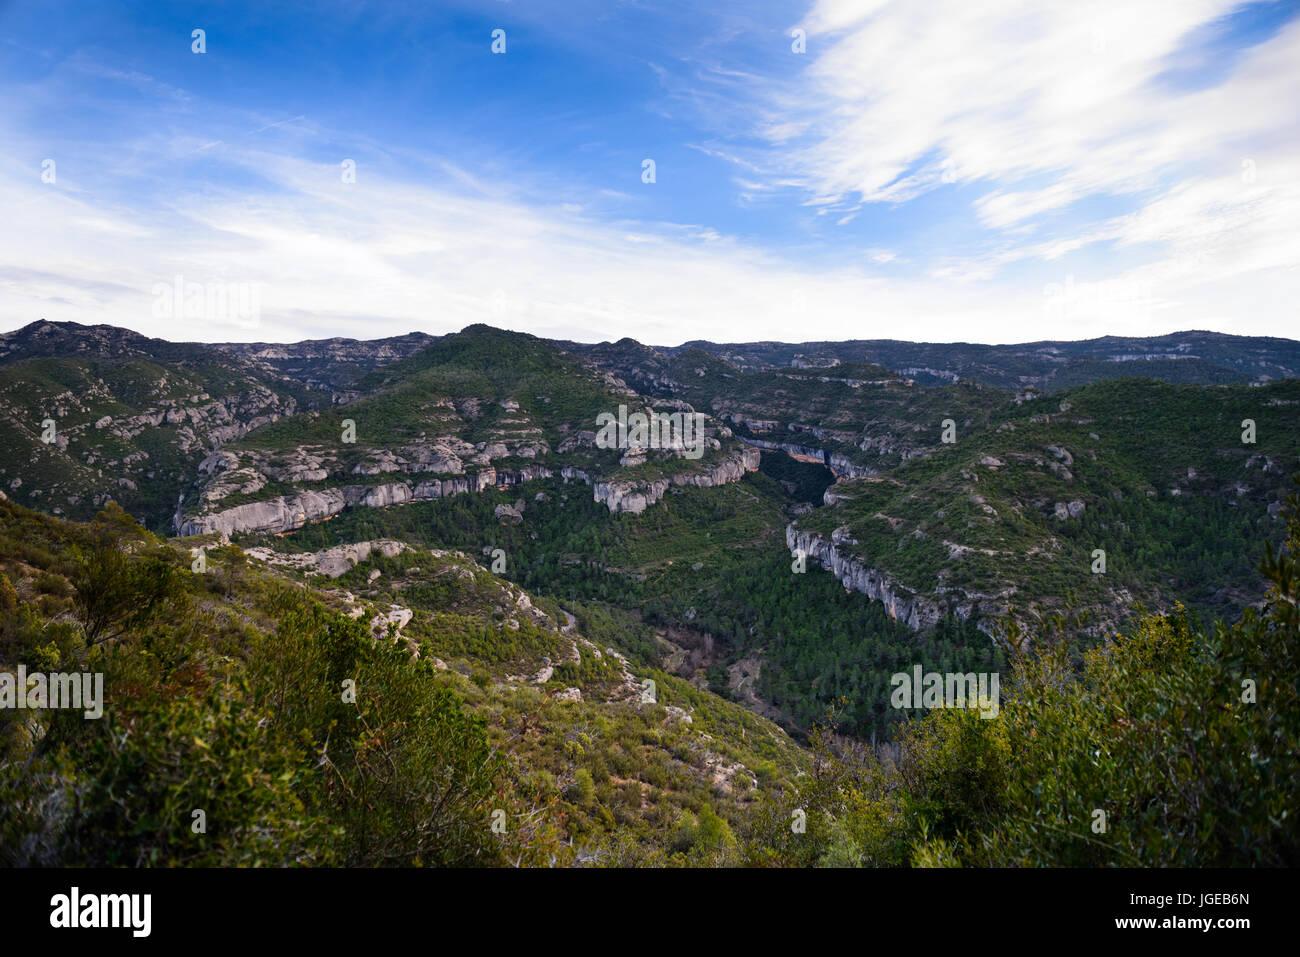 Picturesque landscape at Margalef rocks valley, Catalunia, Spain. - Stock Image